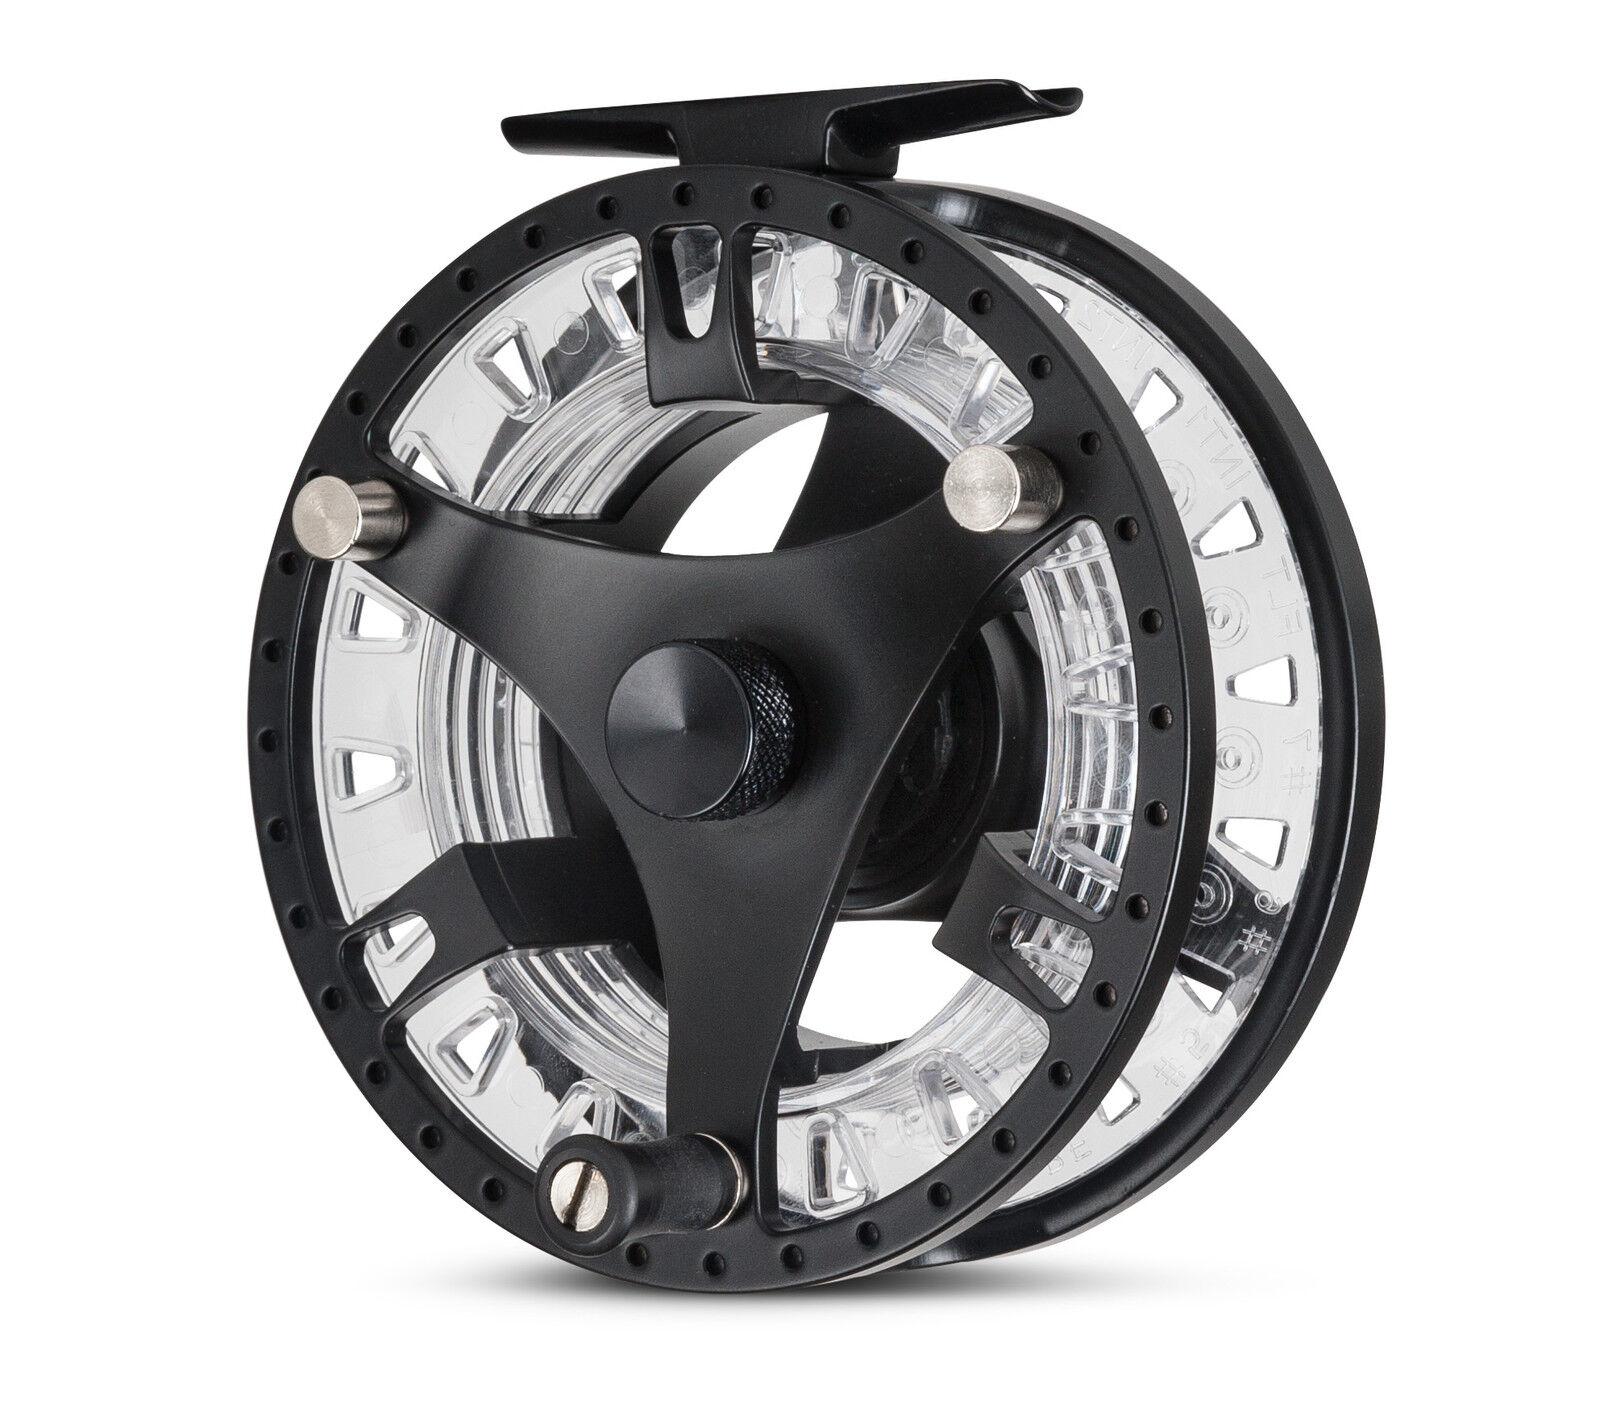 Greys GTS500 Fly Fishing Reel  -  8 9 - 1360962  comfortable